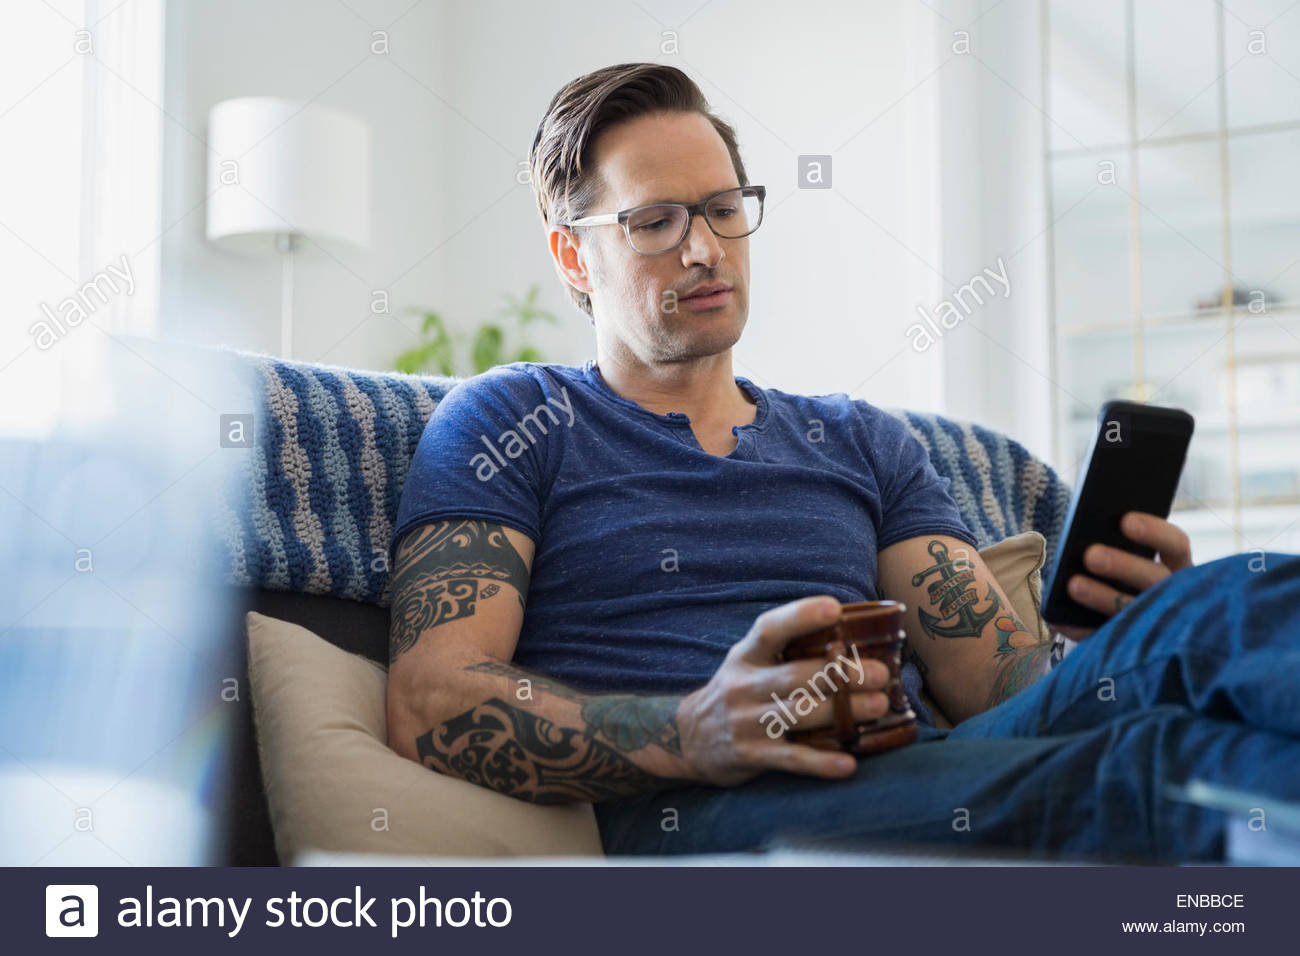 arm with tattoos stockfotos arm with tattoos bilder alamy. Black Bedroom Furniture Sets. Home Design Ideas